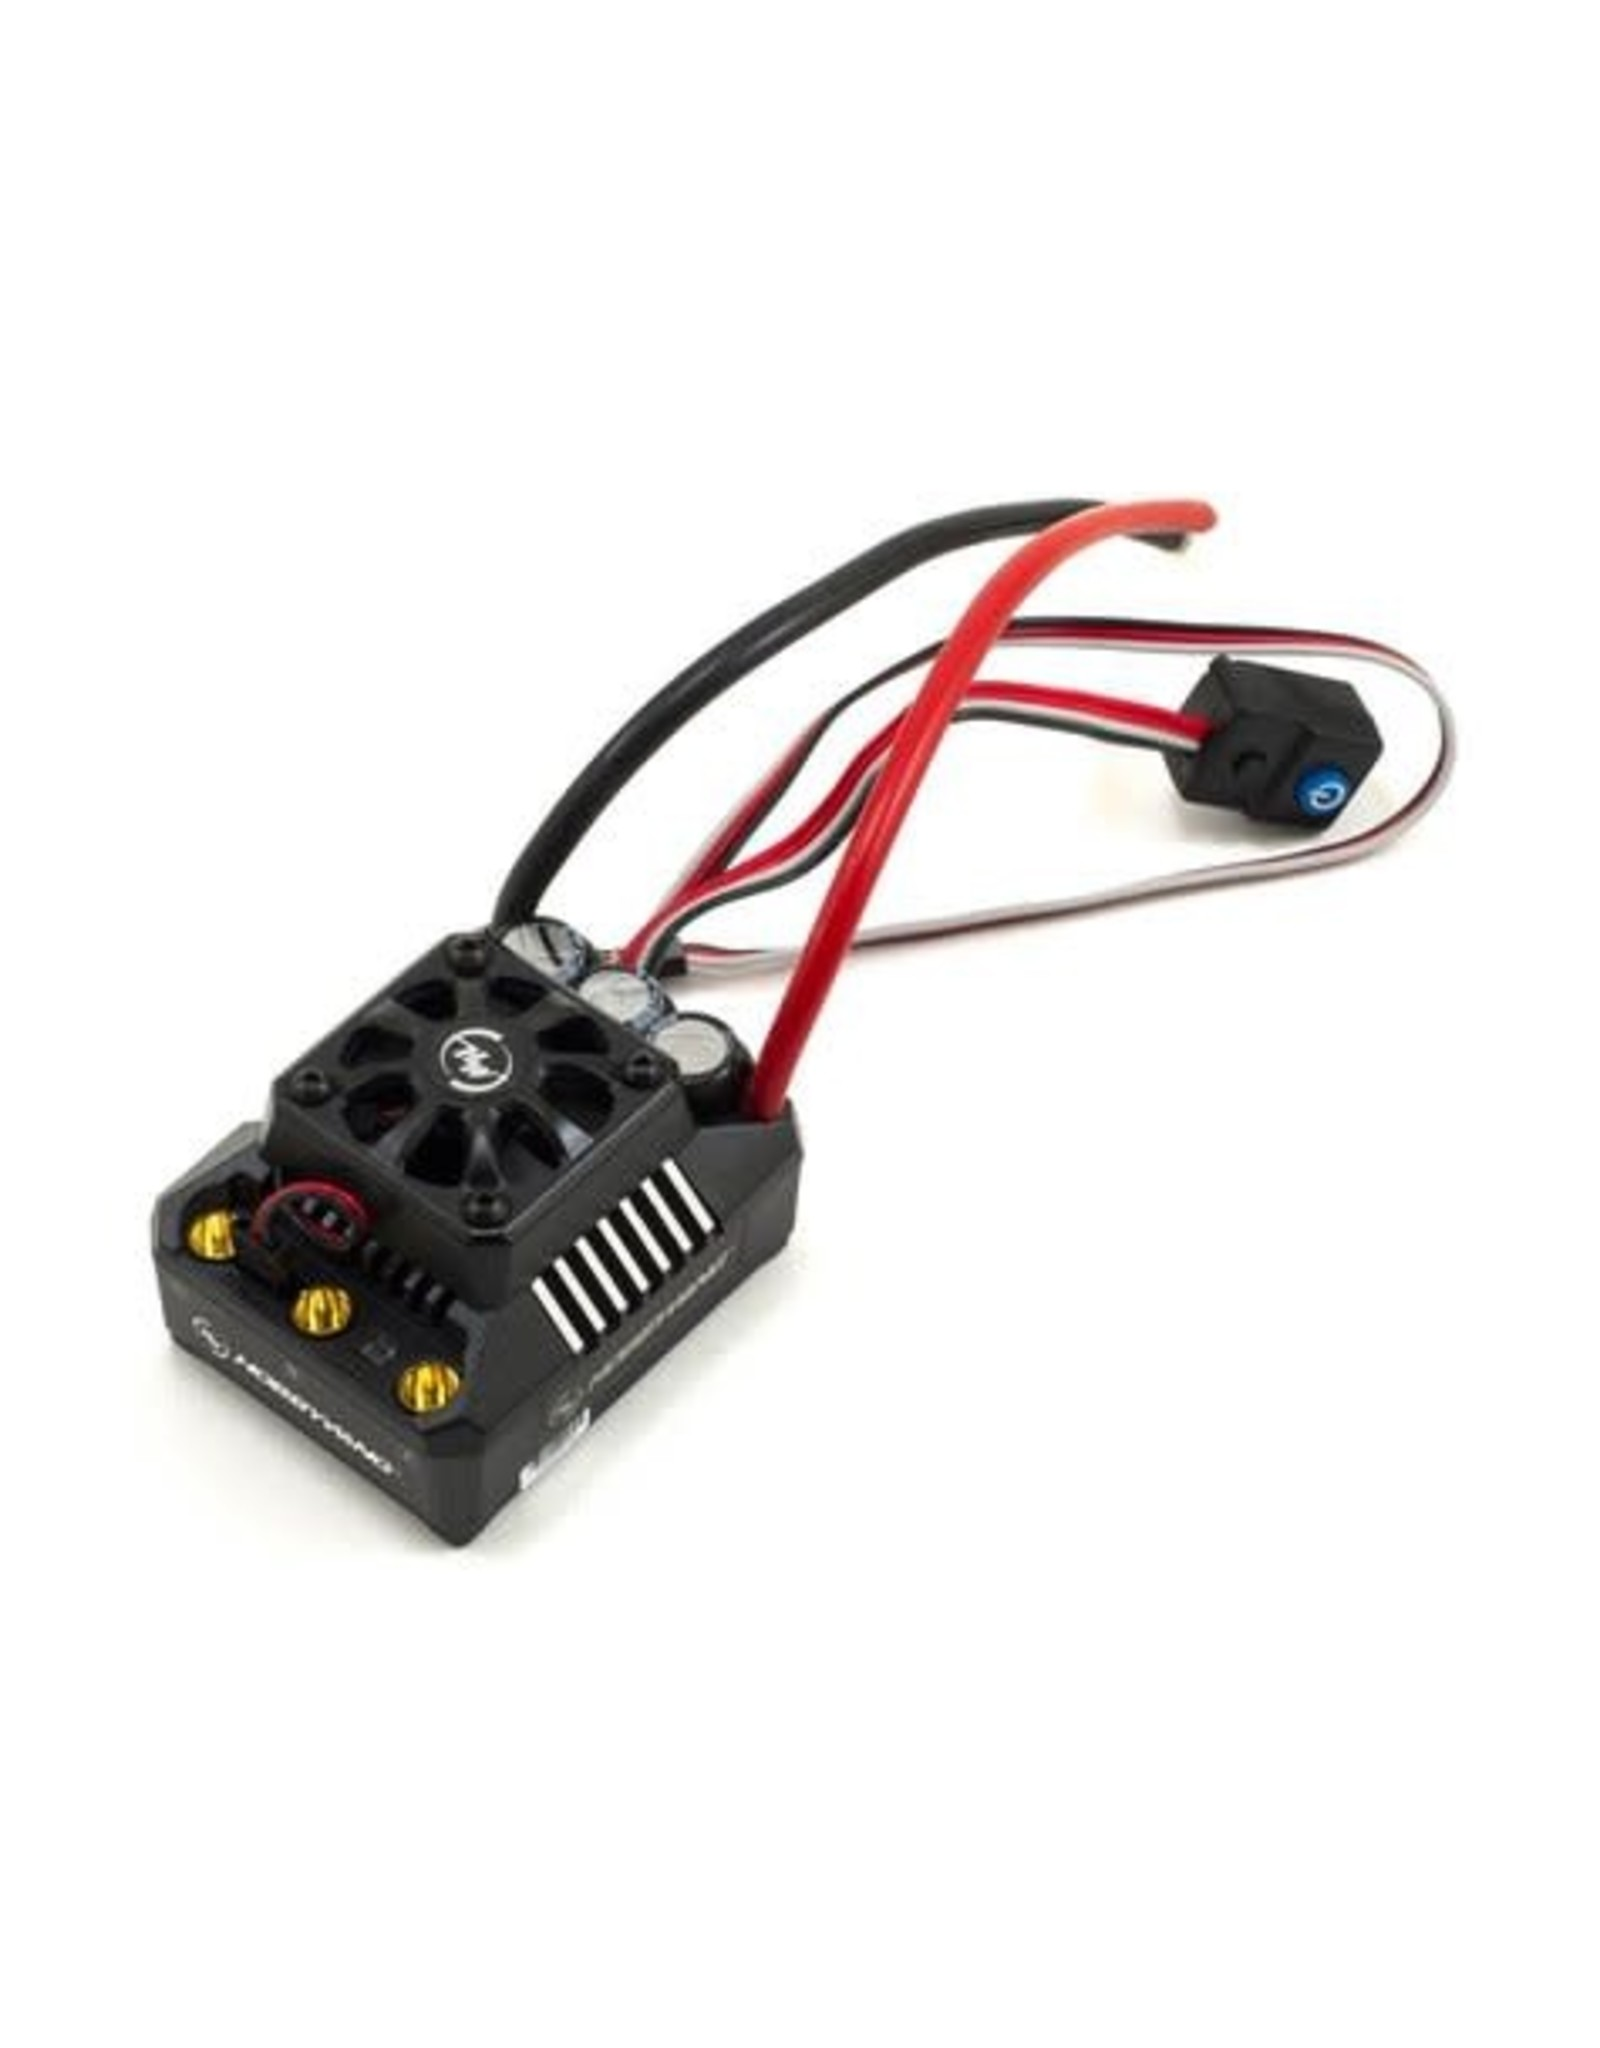 Hobbywing Ezrun MAX 6 ESC (3-8S)